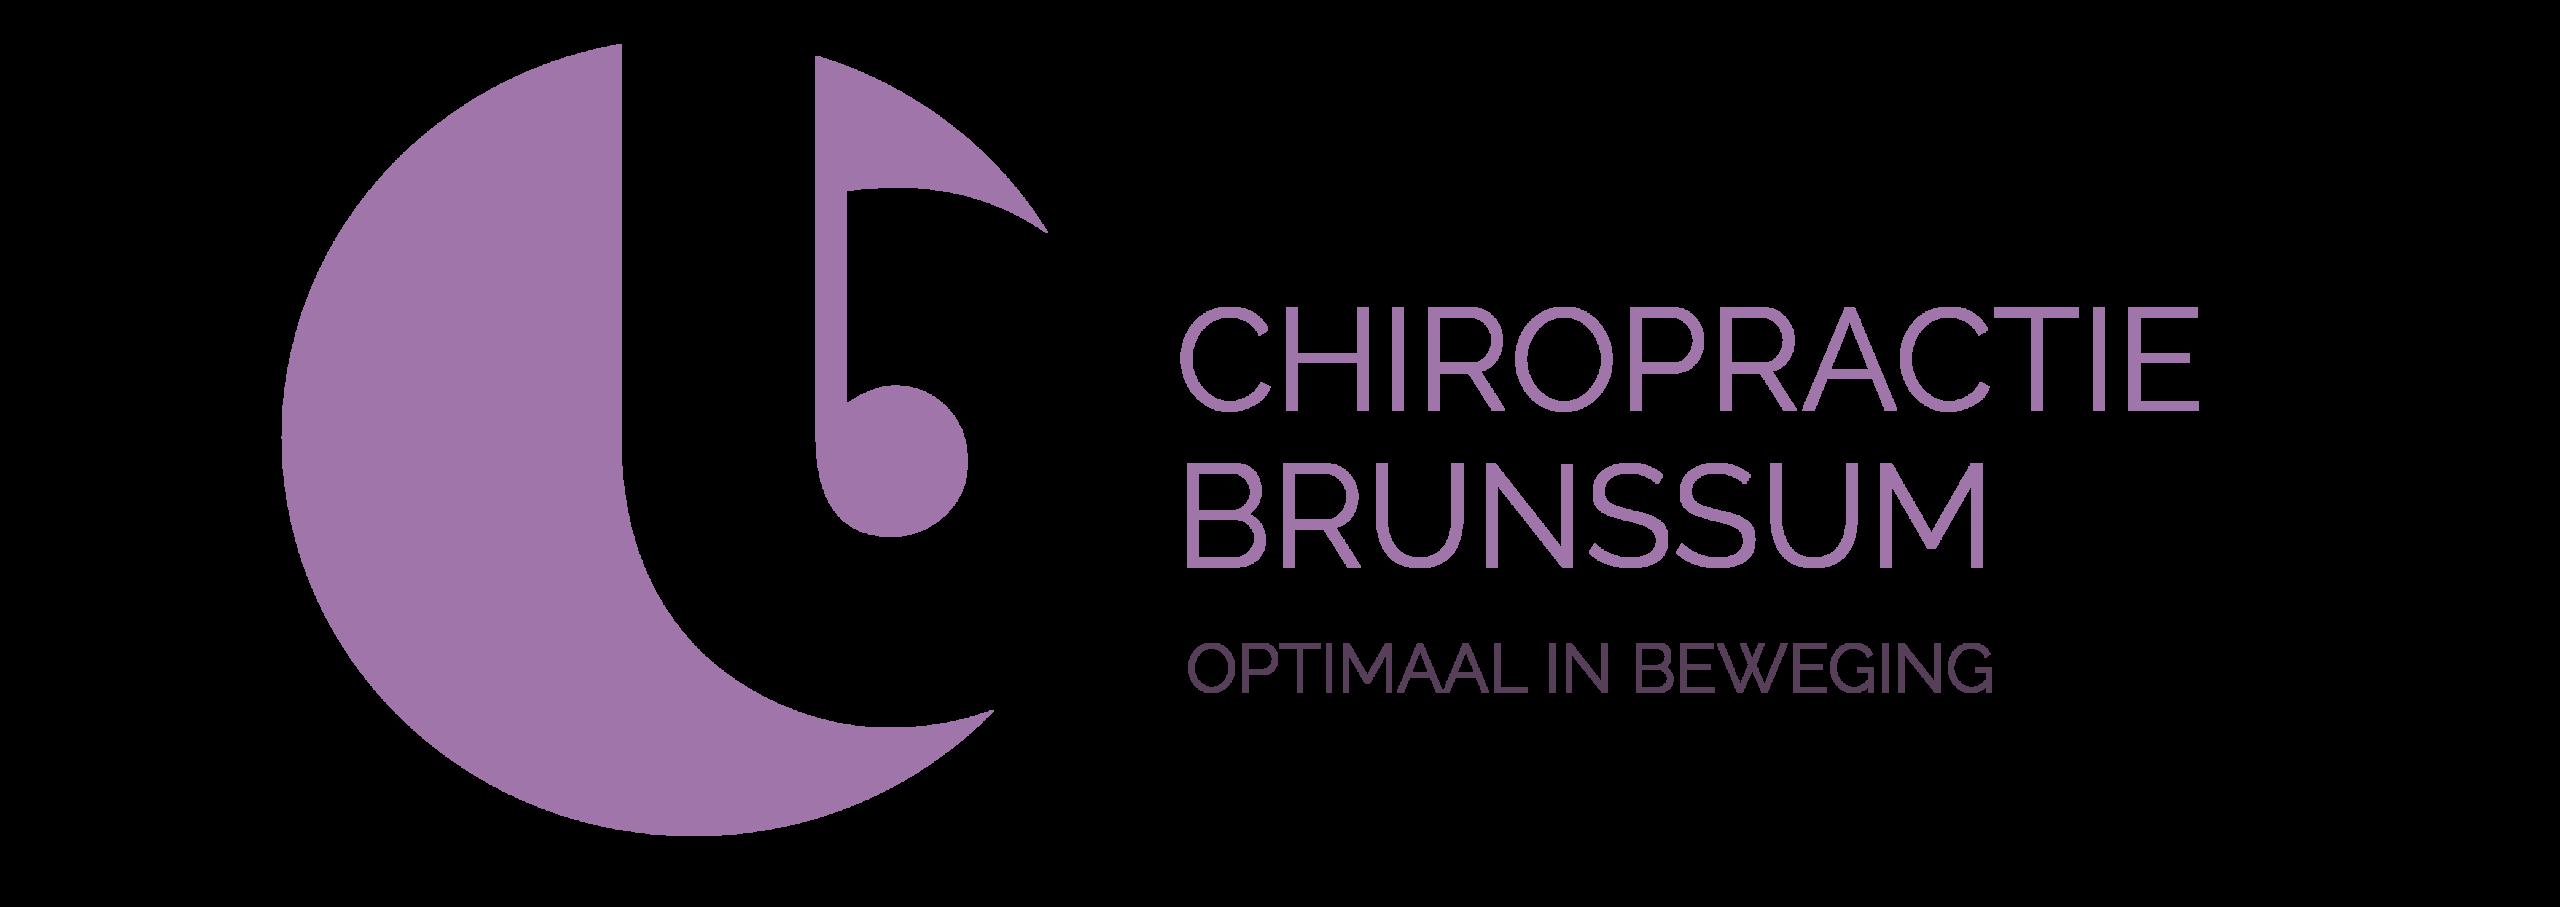 CHIROPRACTIE BRUNSSUM